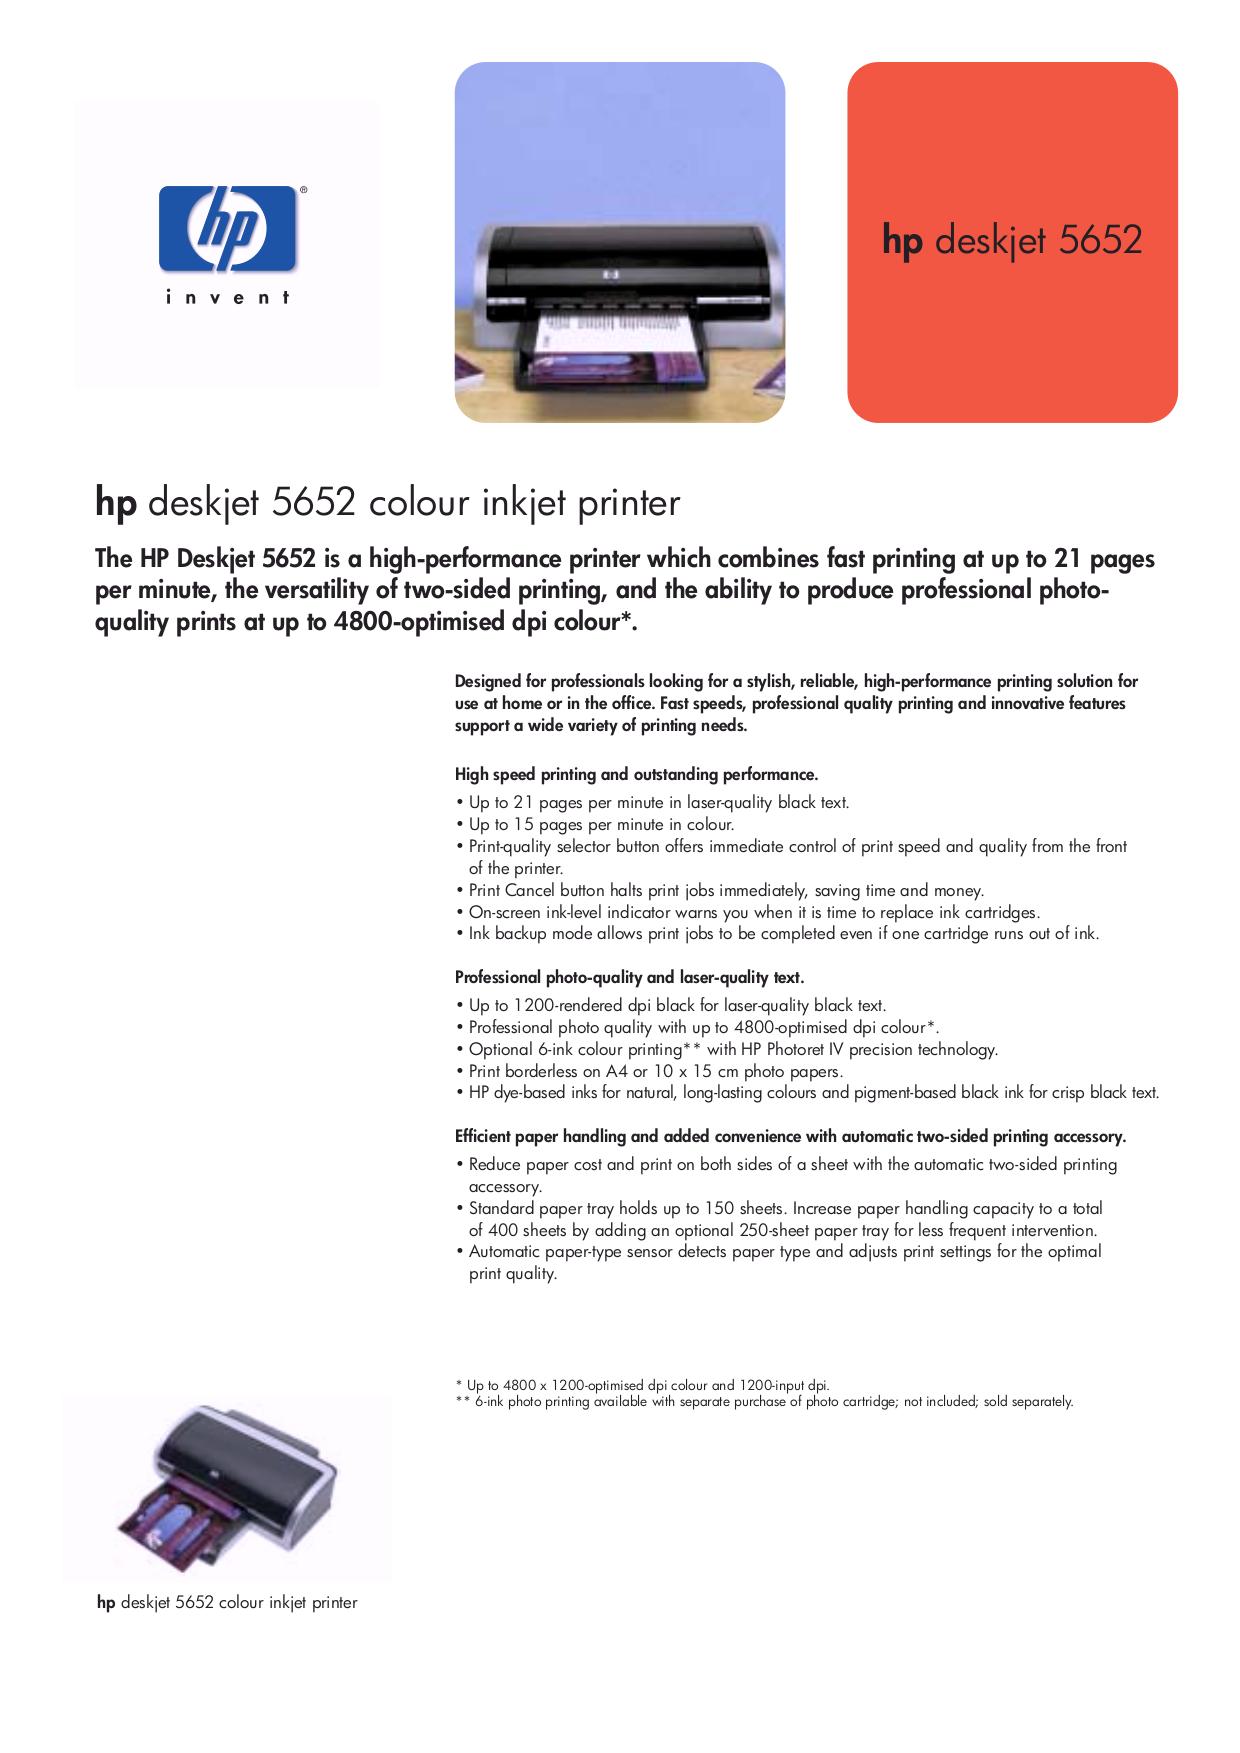 download free pdf for hp deskjet 5652 printer manual rh umlib com HP 2622 Deskjet Printer Manual hp deskjet 400 printer driver windows 7